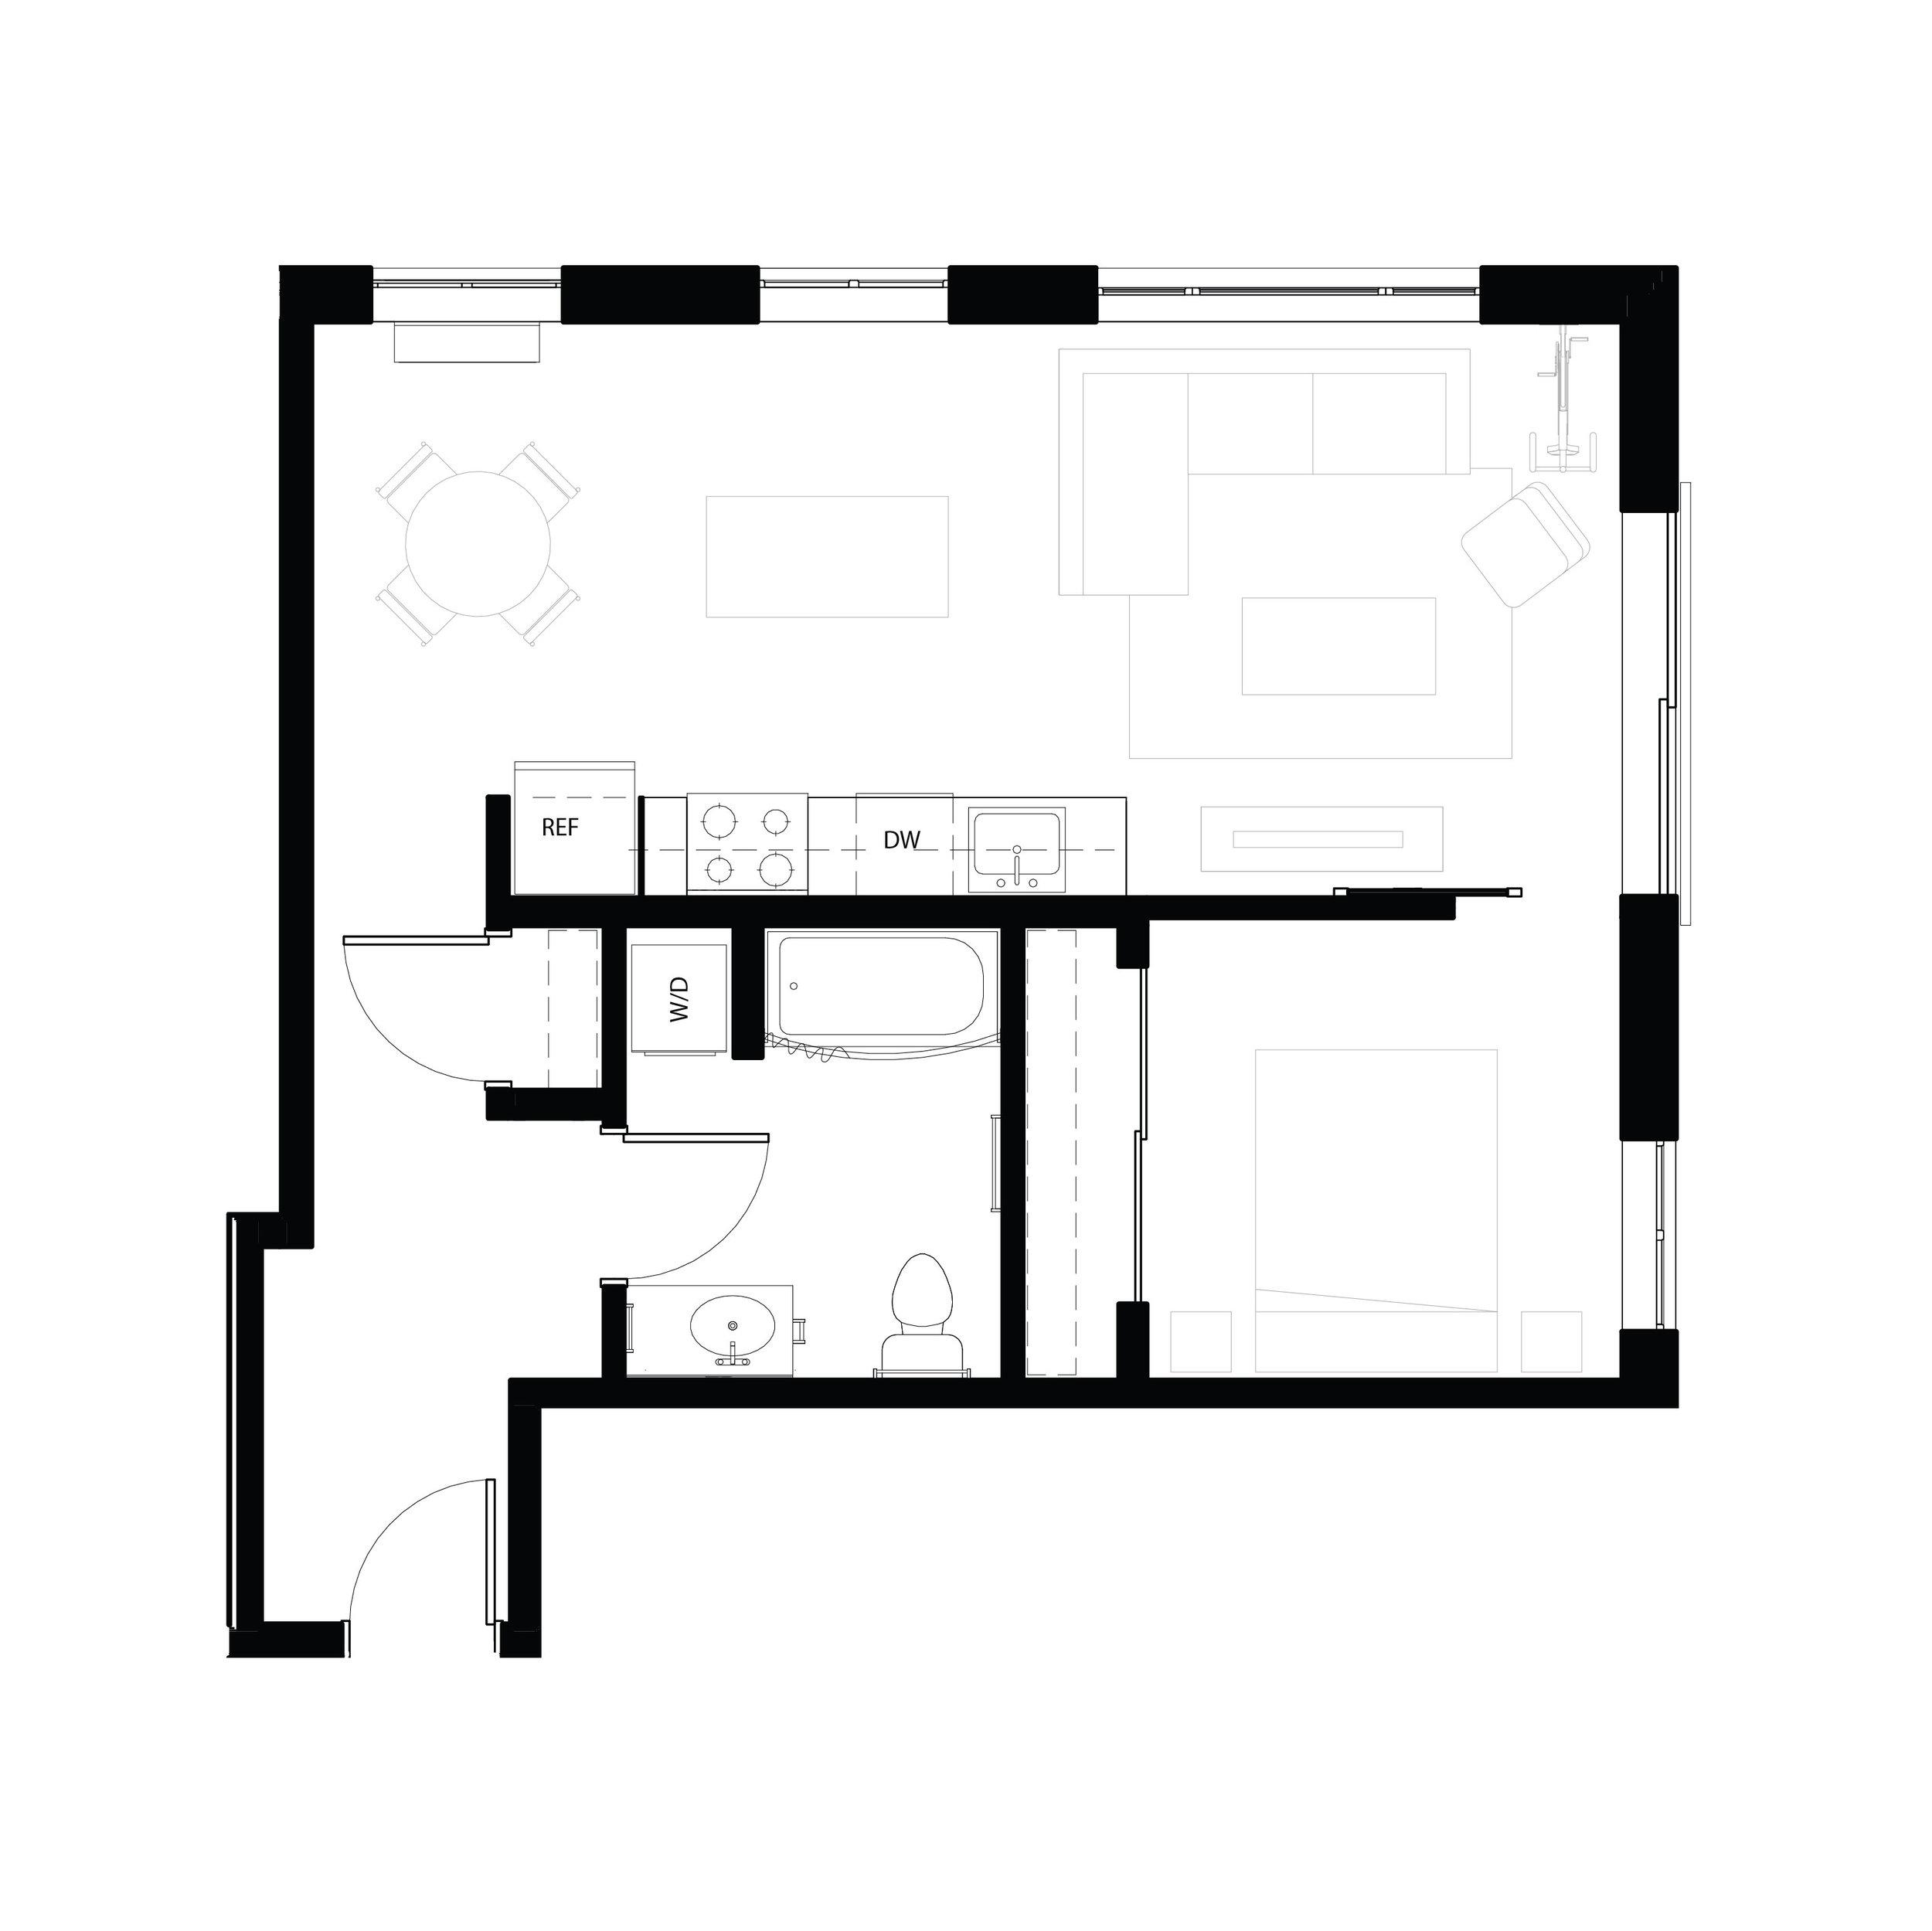 One bedroom 675 sq ft